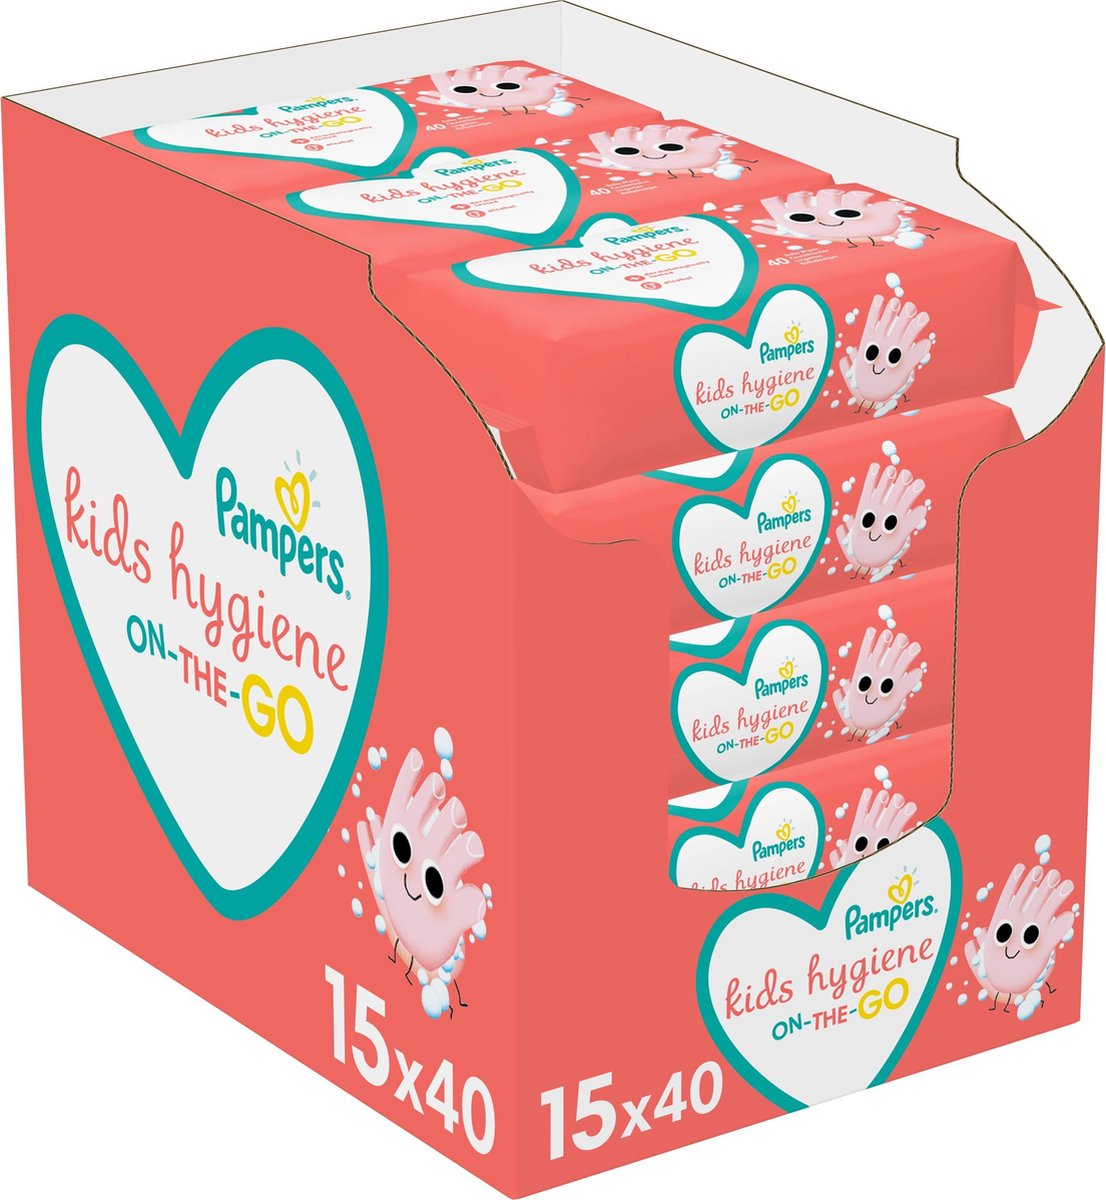 Pampers Kids Hygiene On-The-Go Babydoekjes - 600 stuks